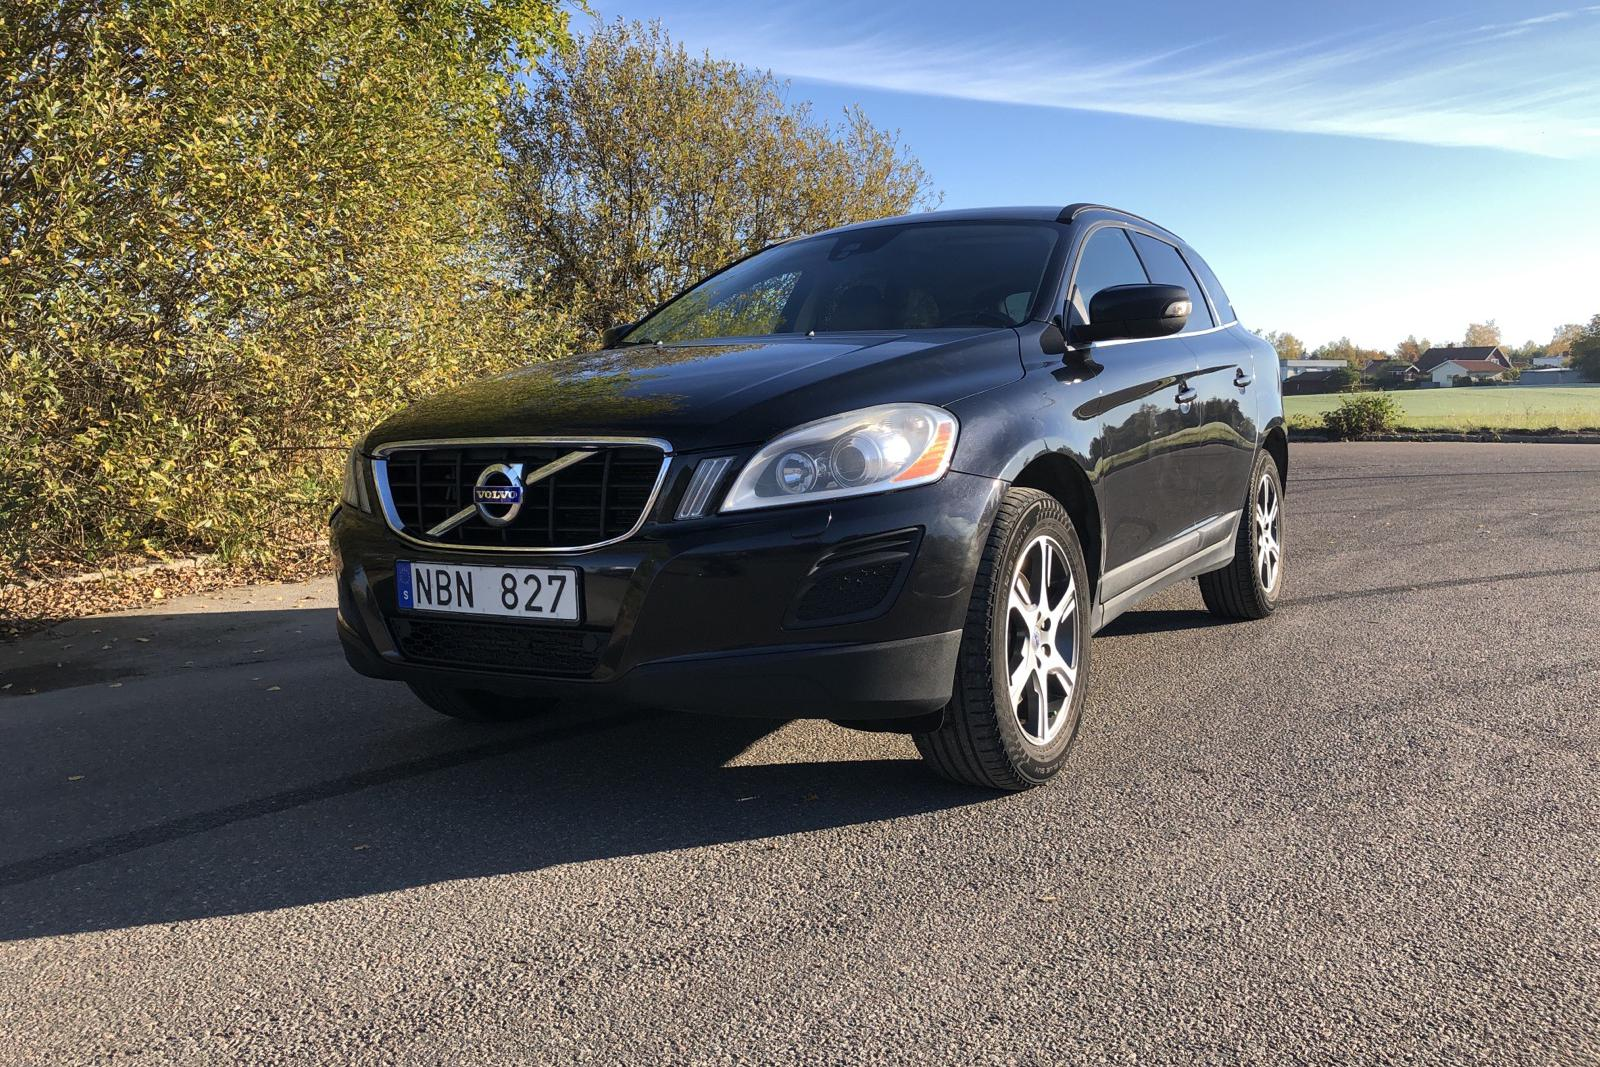 Volvo XC60 D4 AWD Dynamic Edition(163hk) - 208 030 km - Automatic - black - 2013